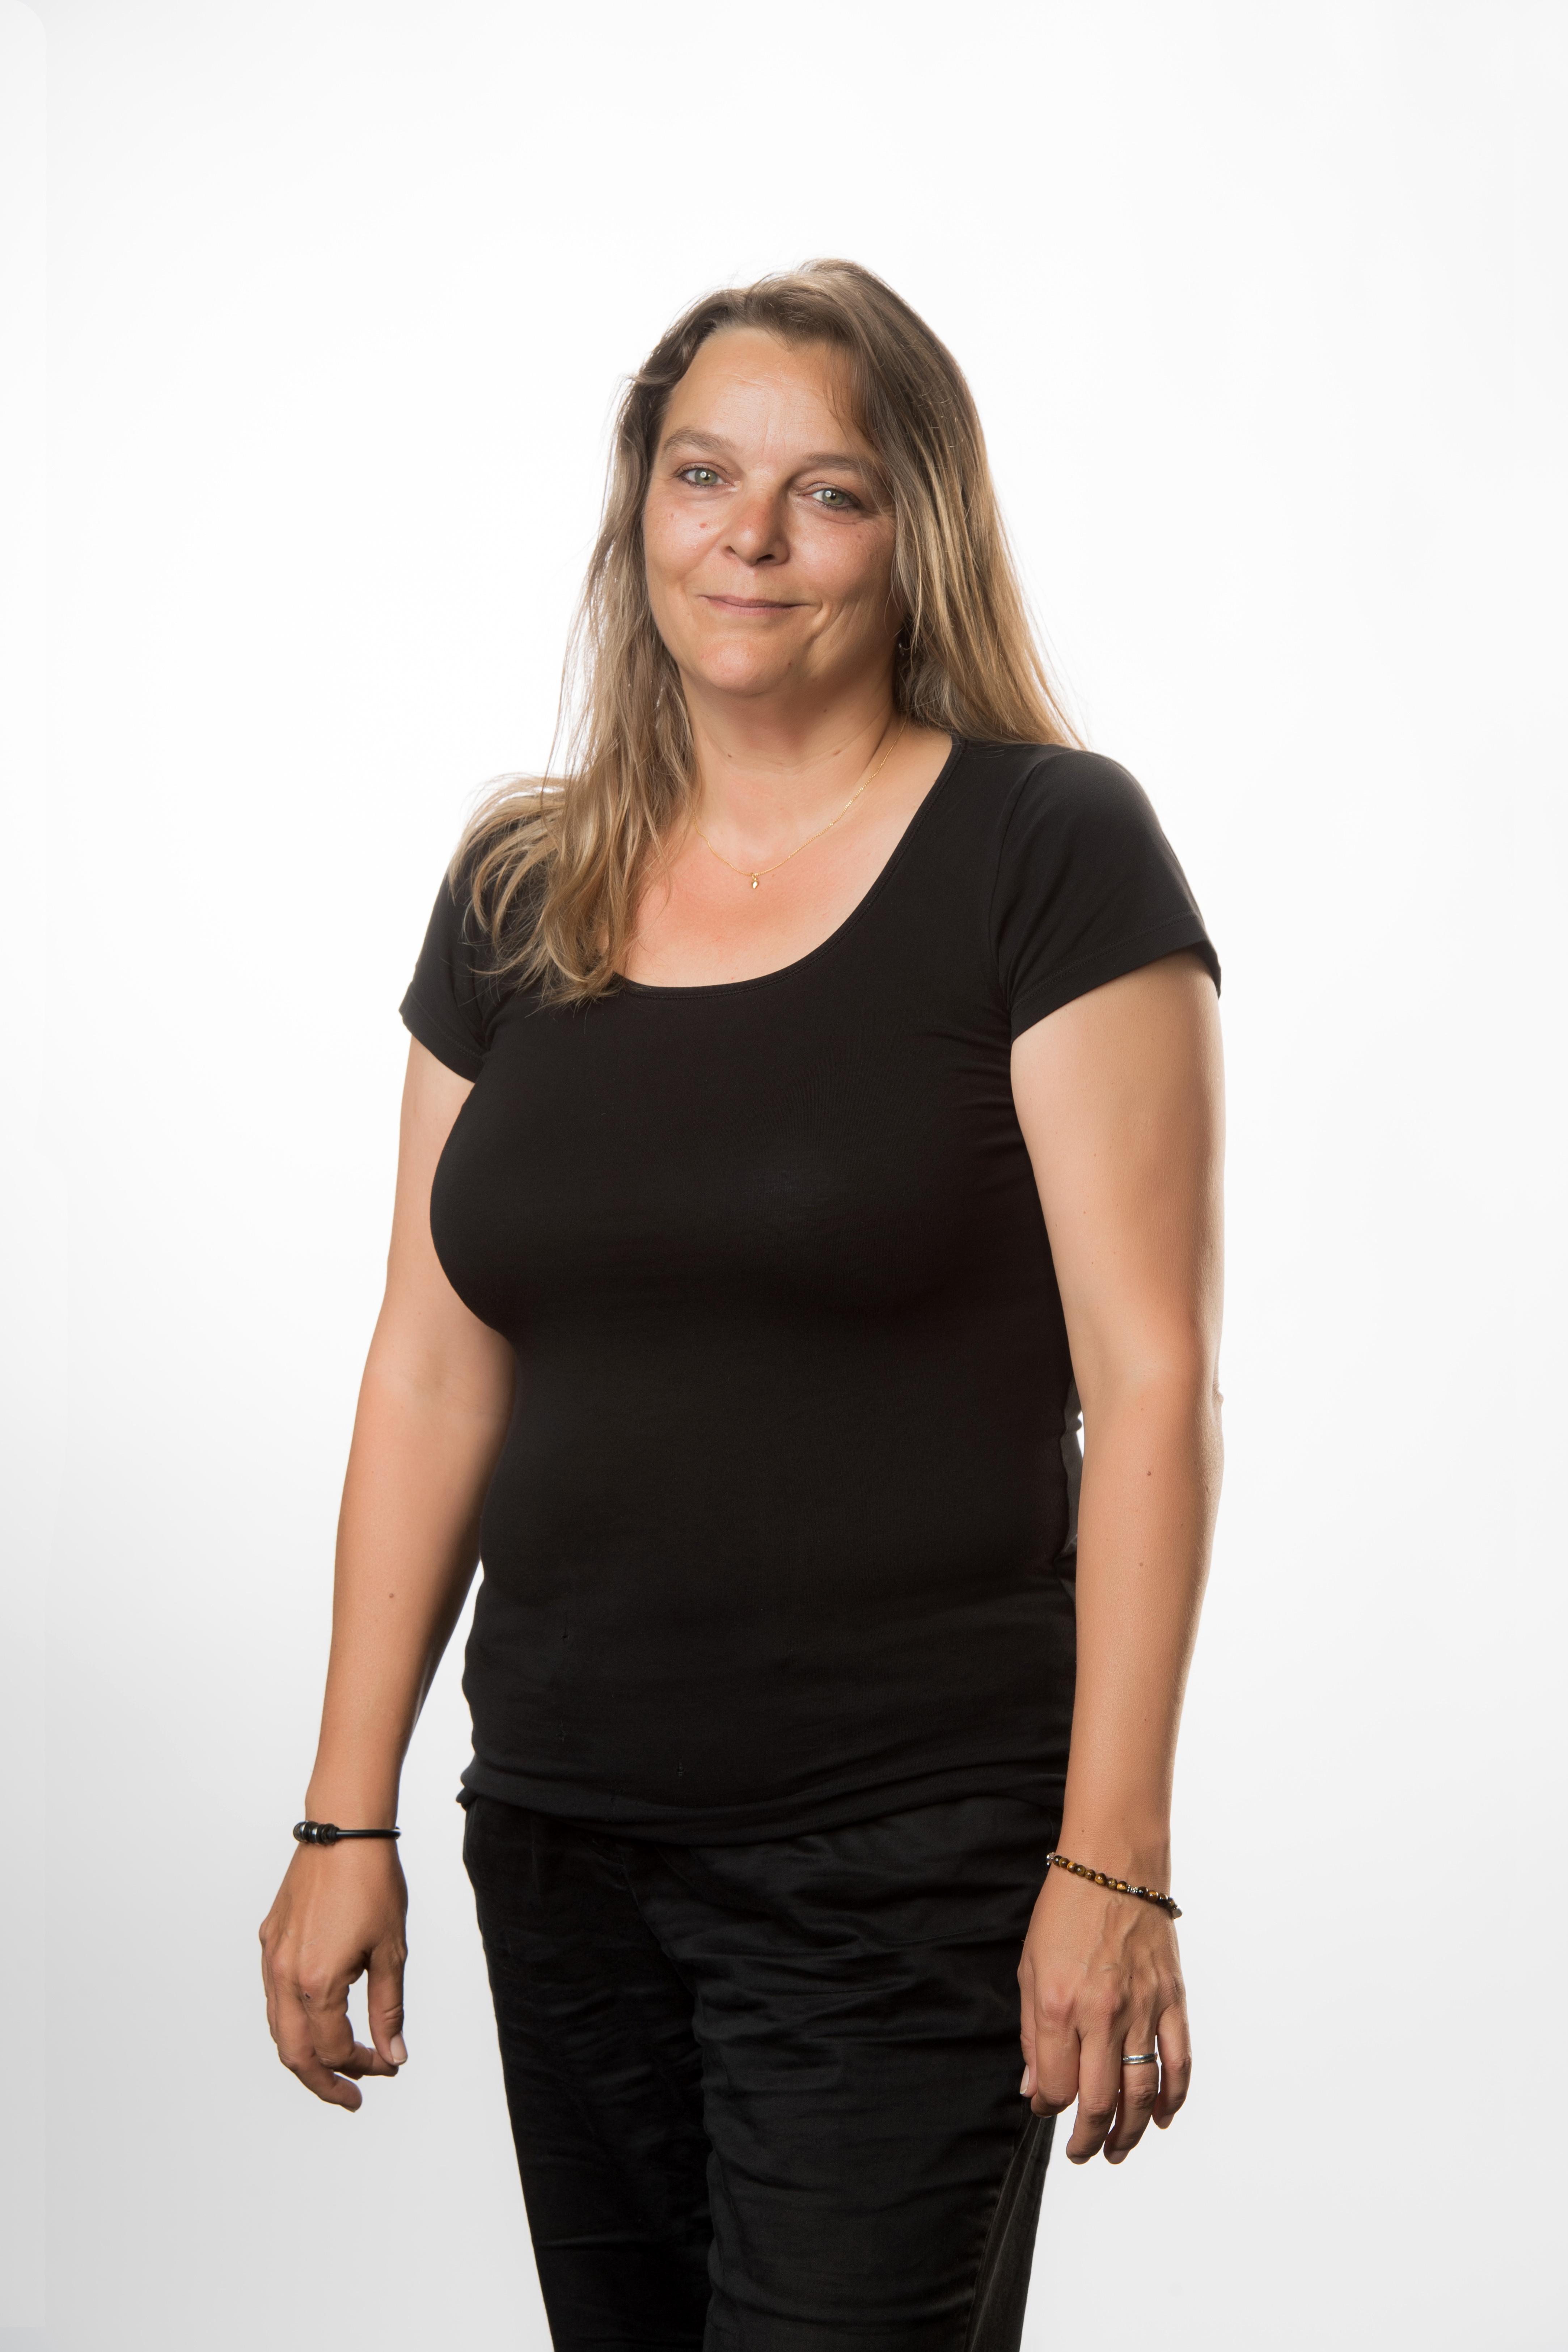 Sylvie Balet-Pralong